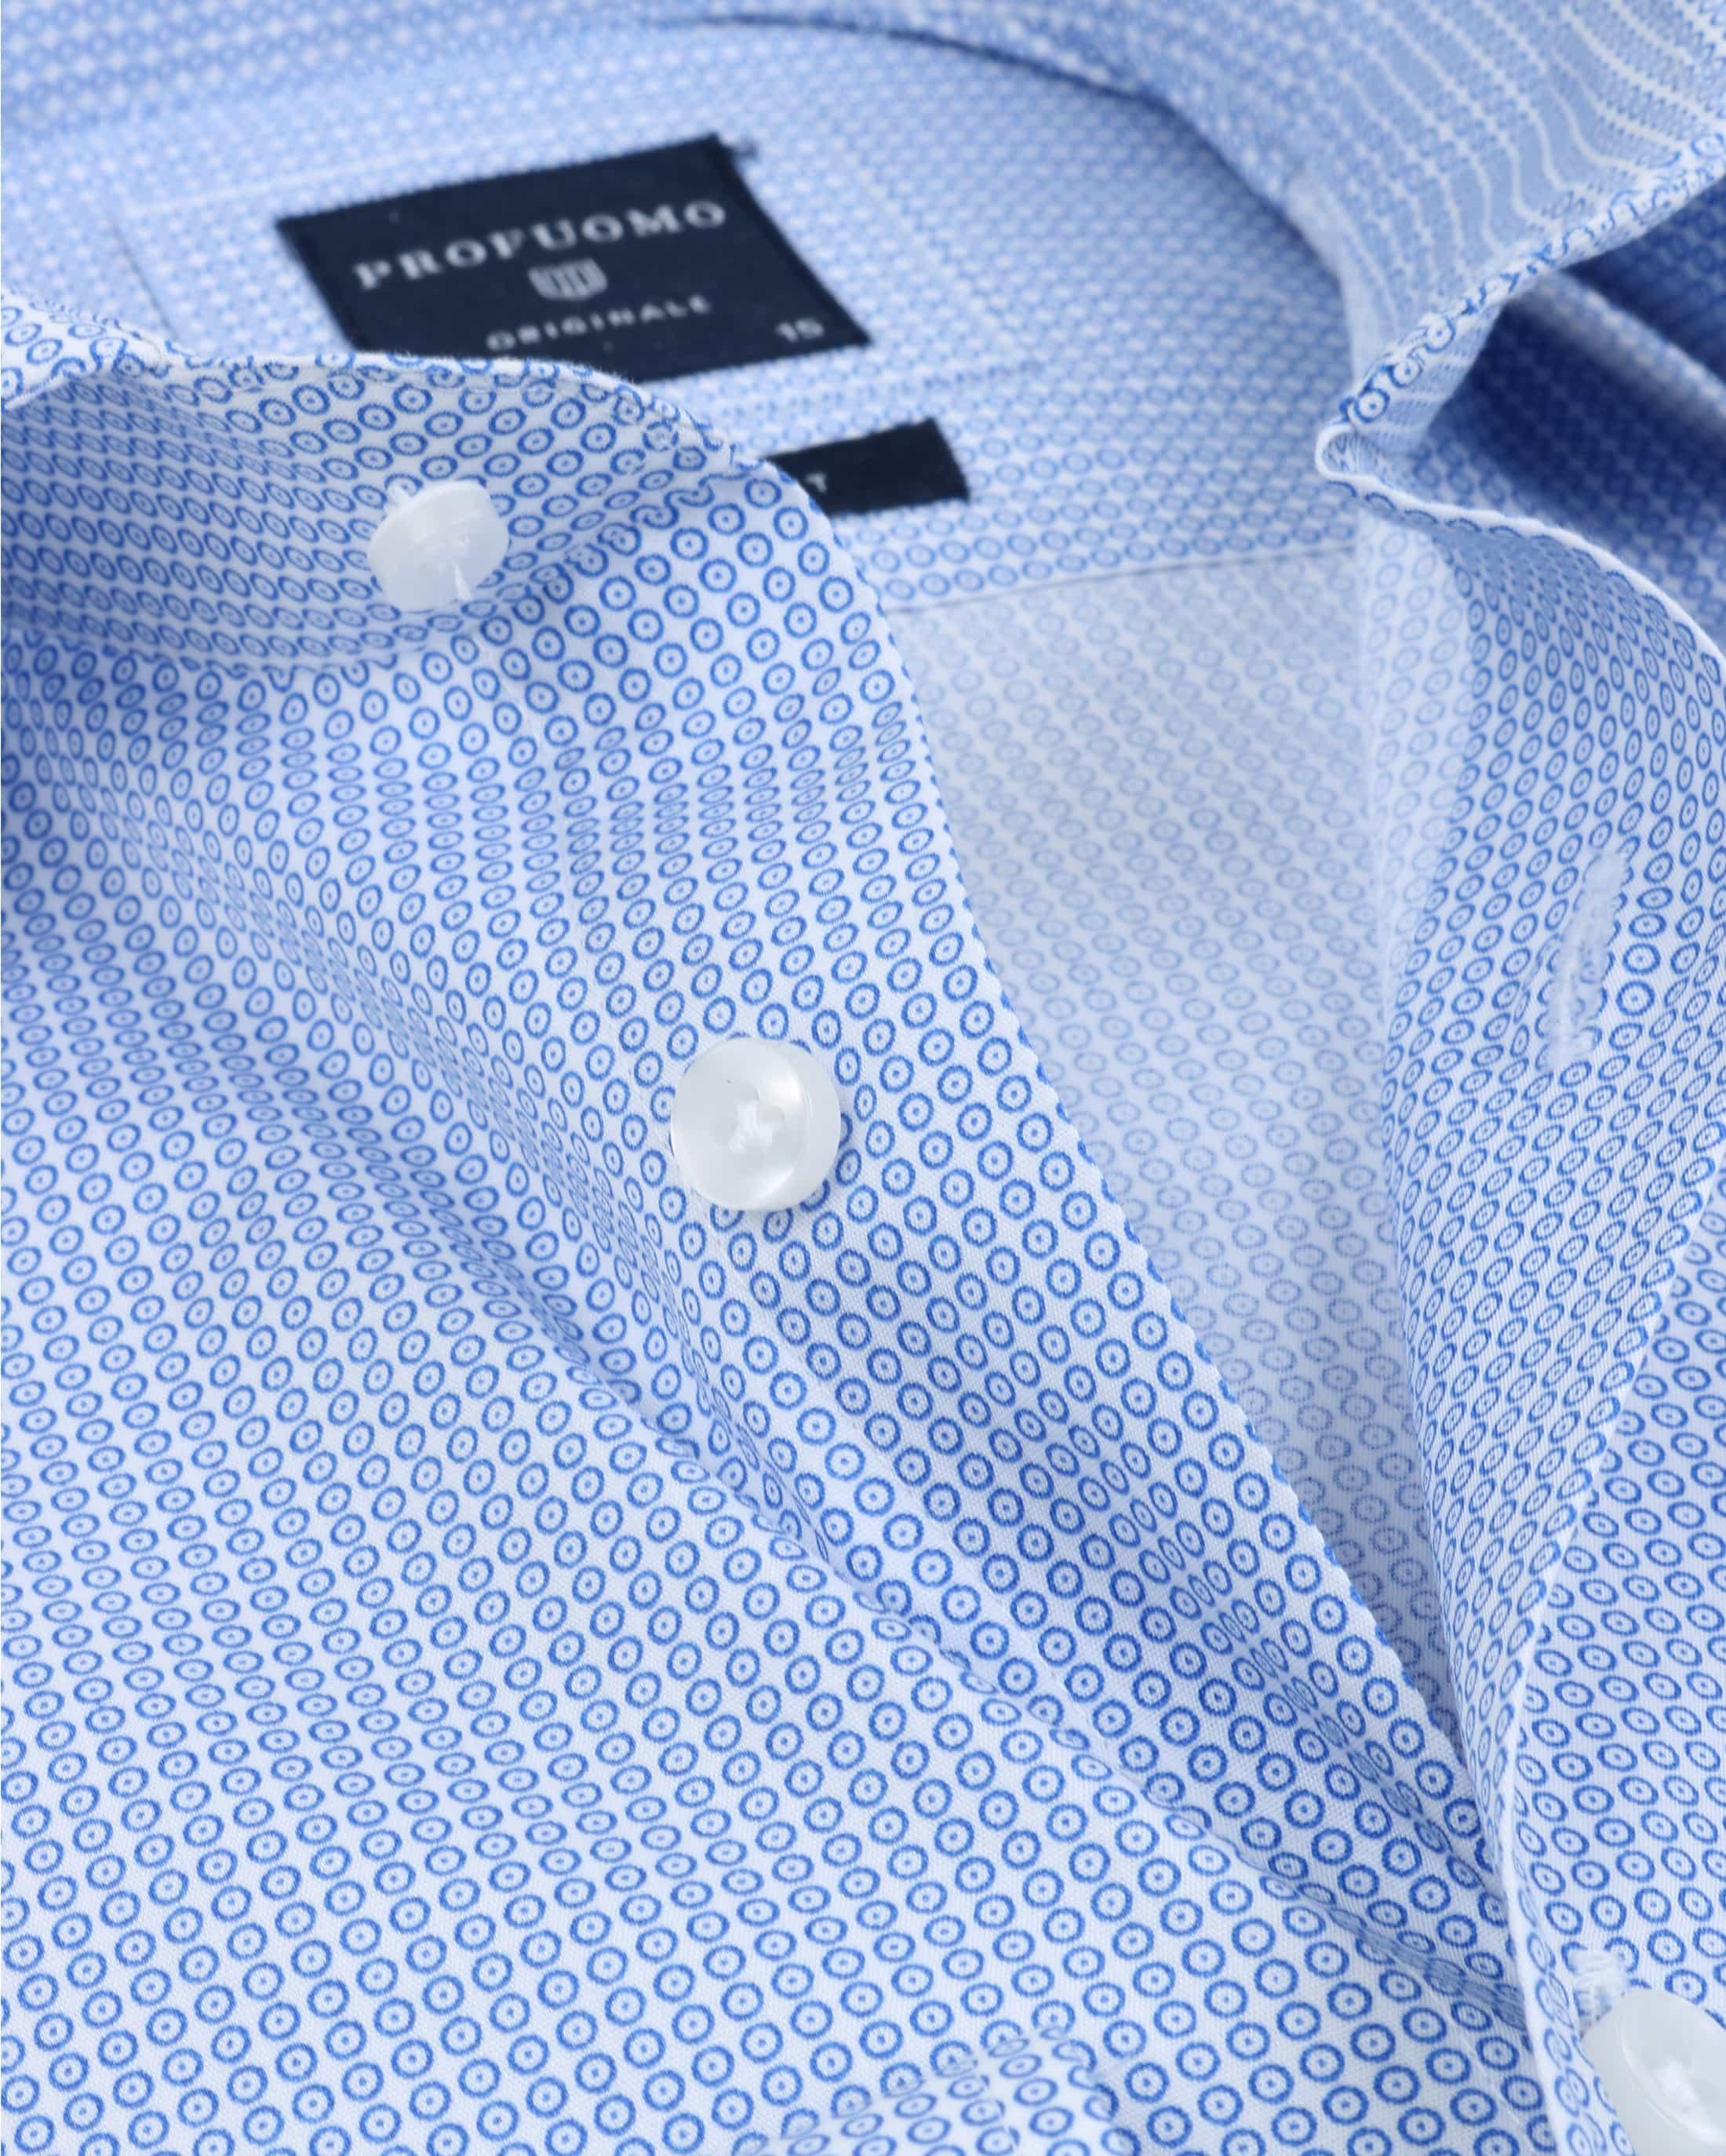 Profuomo Overhemd Dessin Blauw foto 2